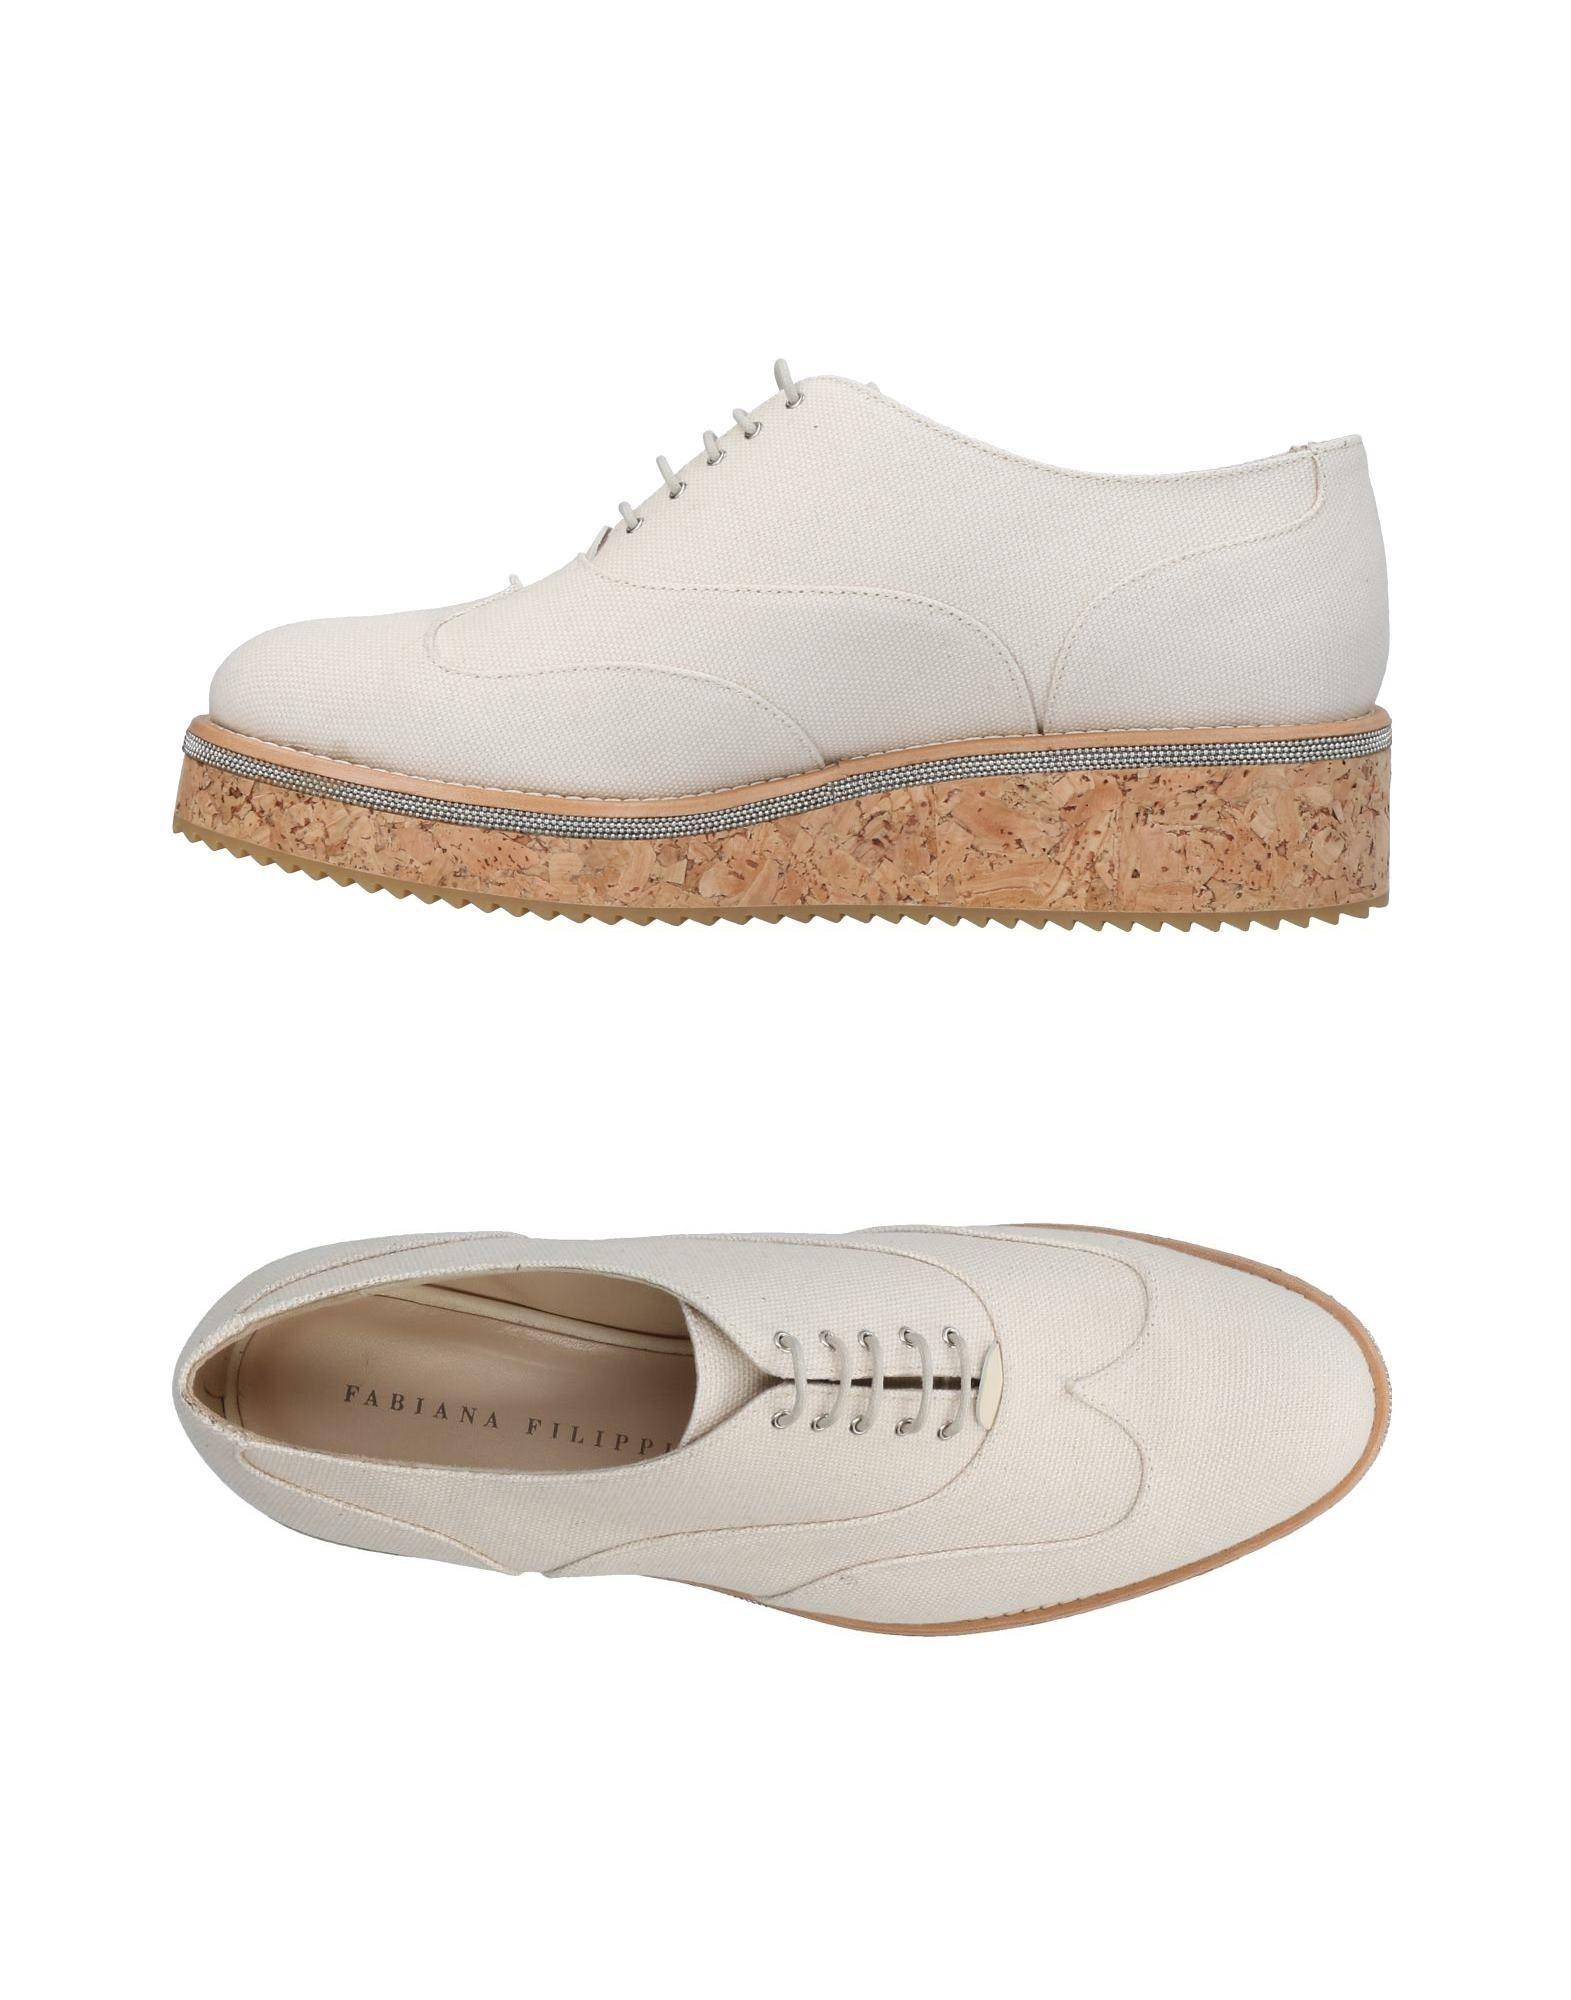 Stilvolle billige Schuhe Fabiana Filippi Schnürschuhe Damen  11443863VV